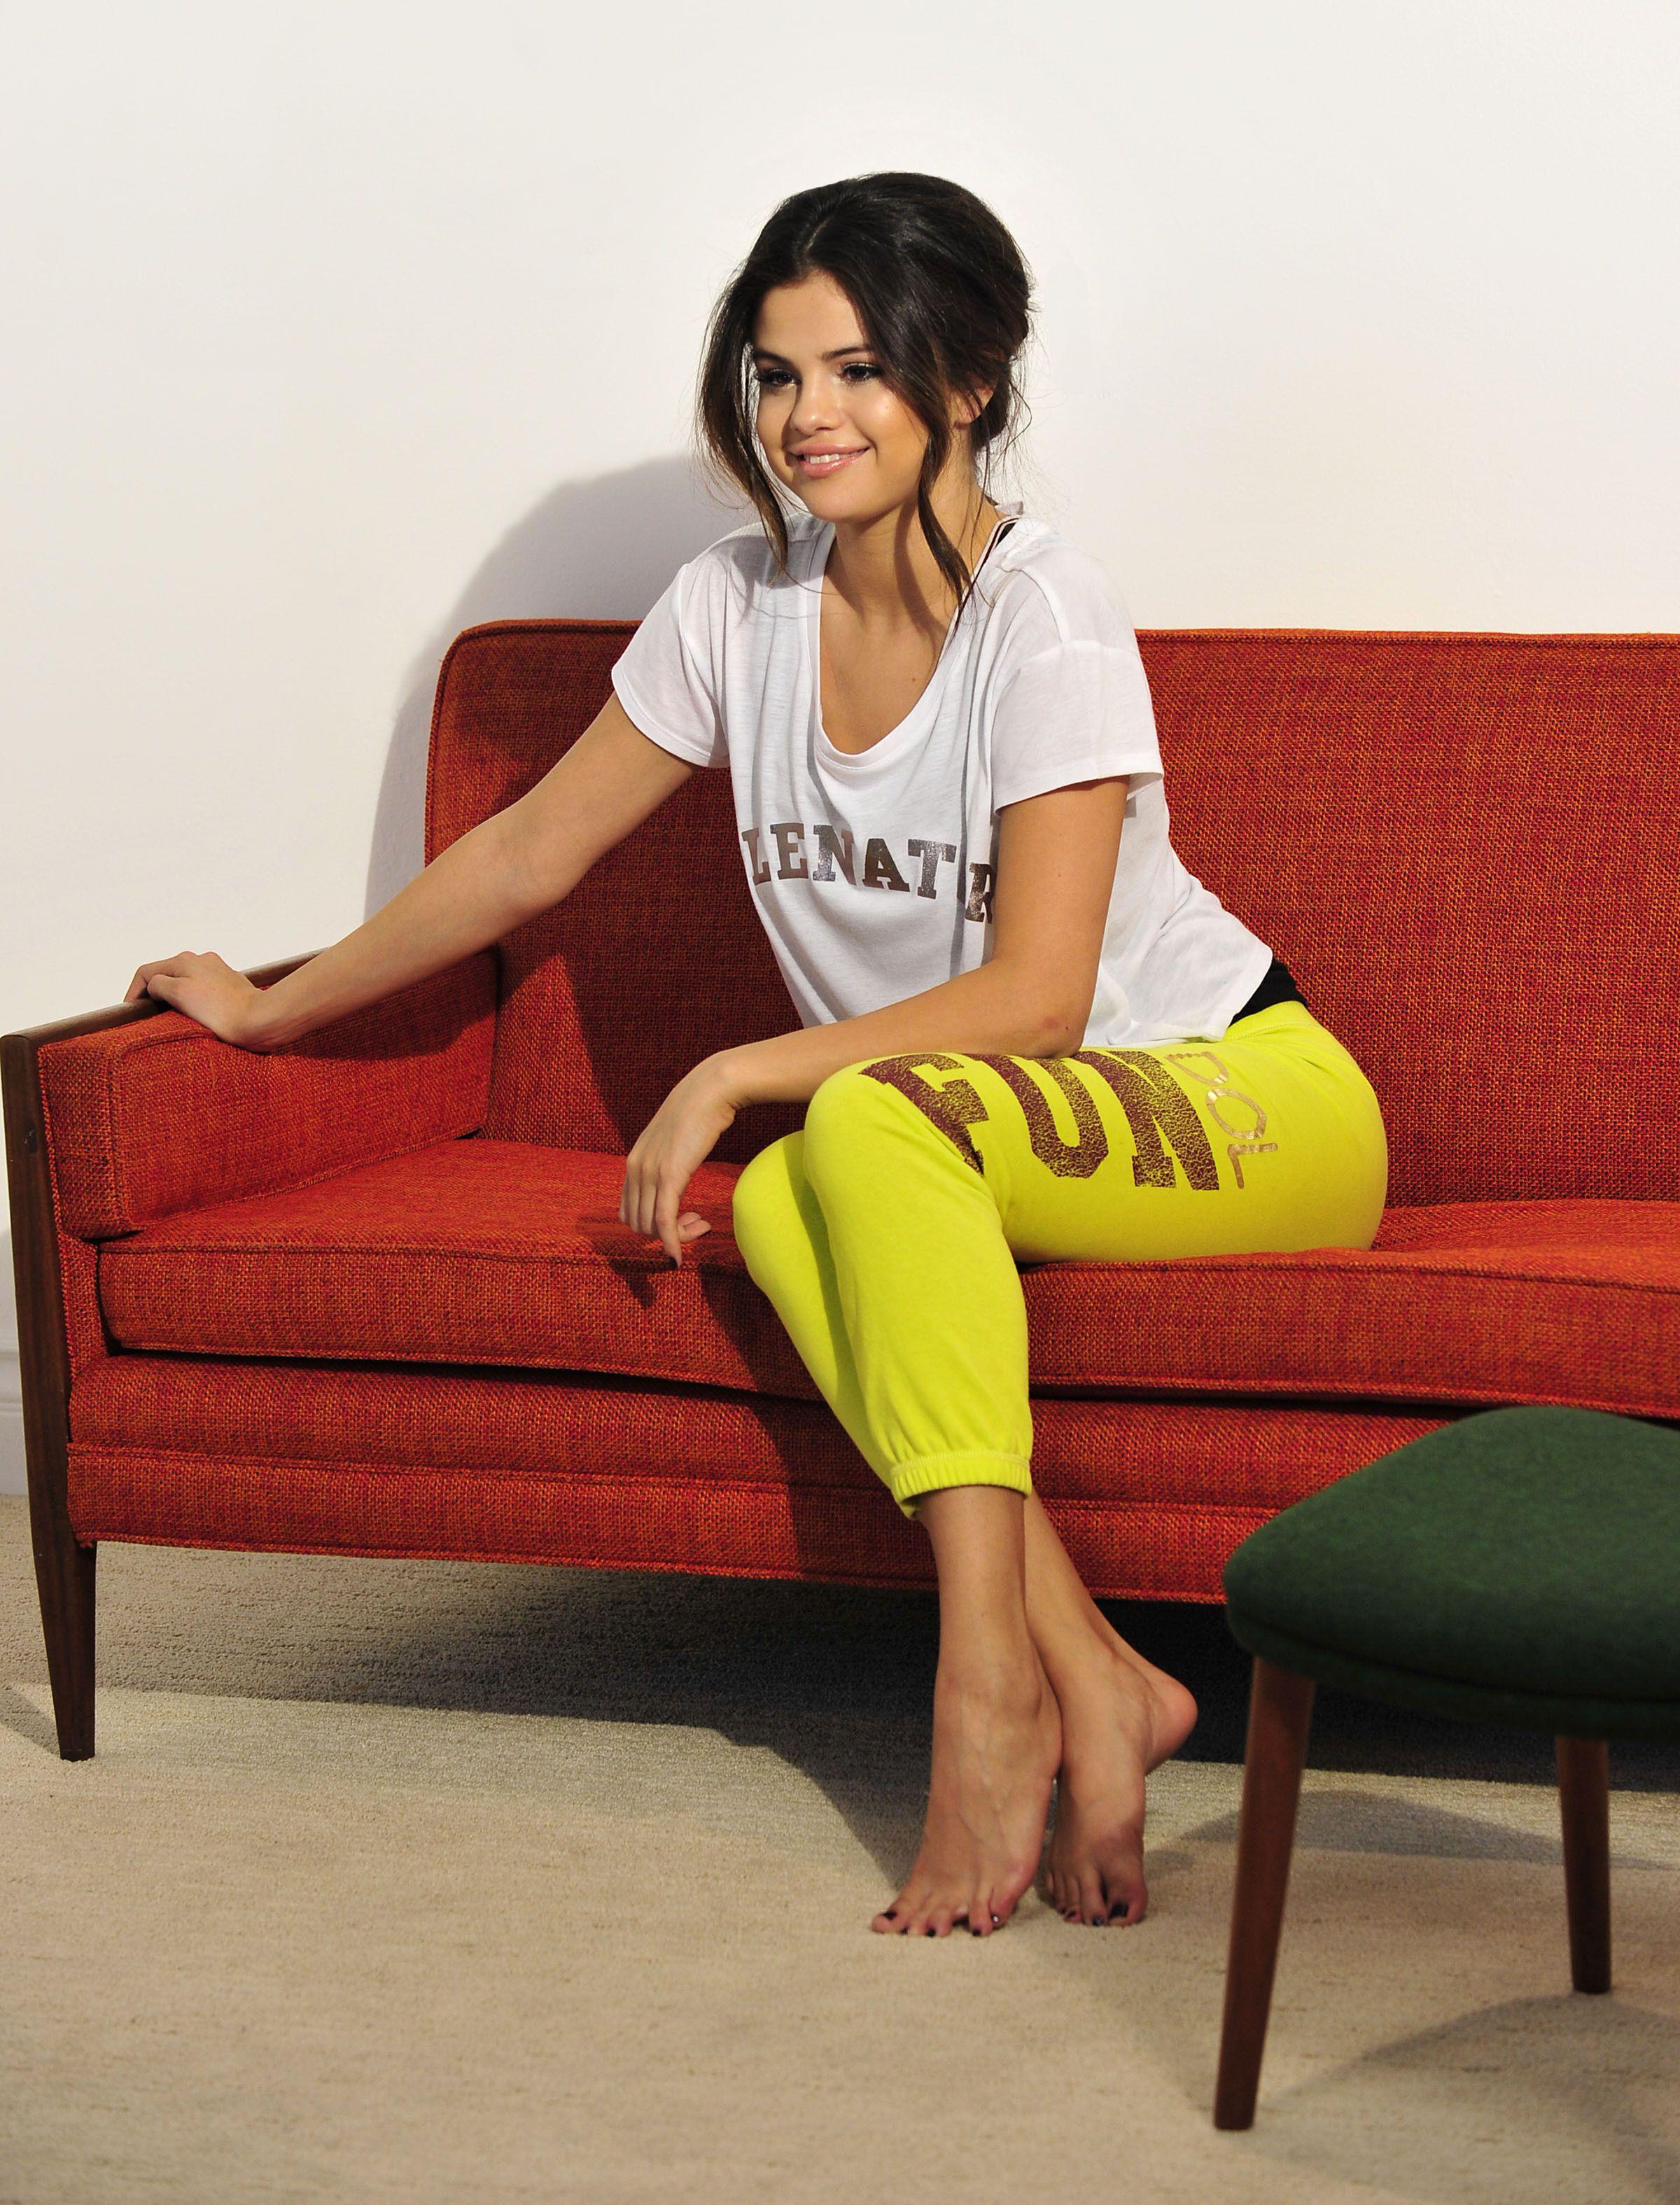 Selena Gomez Feet 1389575 Jpg 2 400 3 150 P Xeles Pieds  # Gabriela Gez Muebles